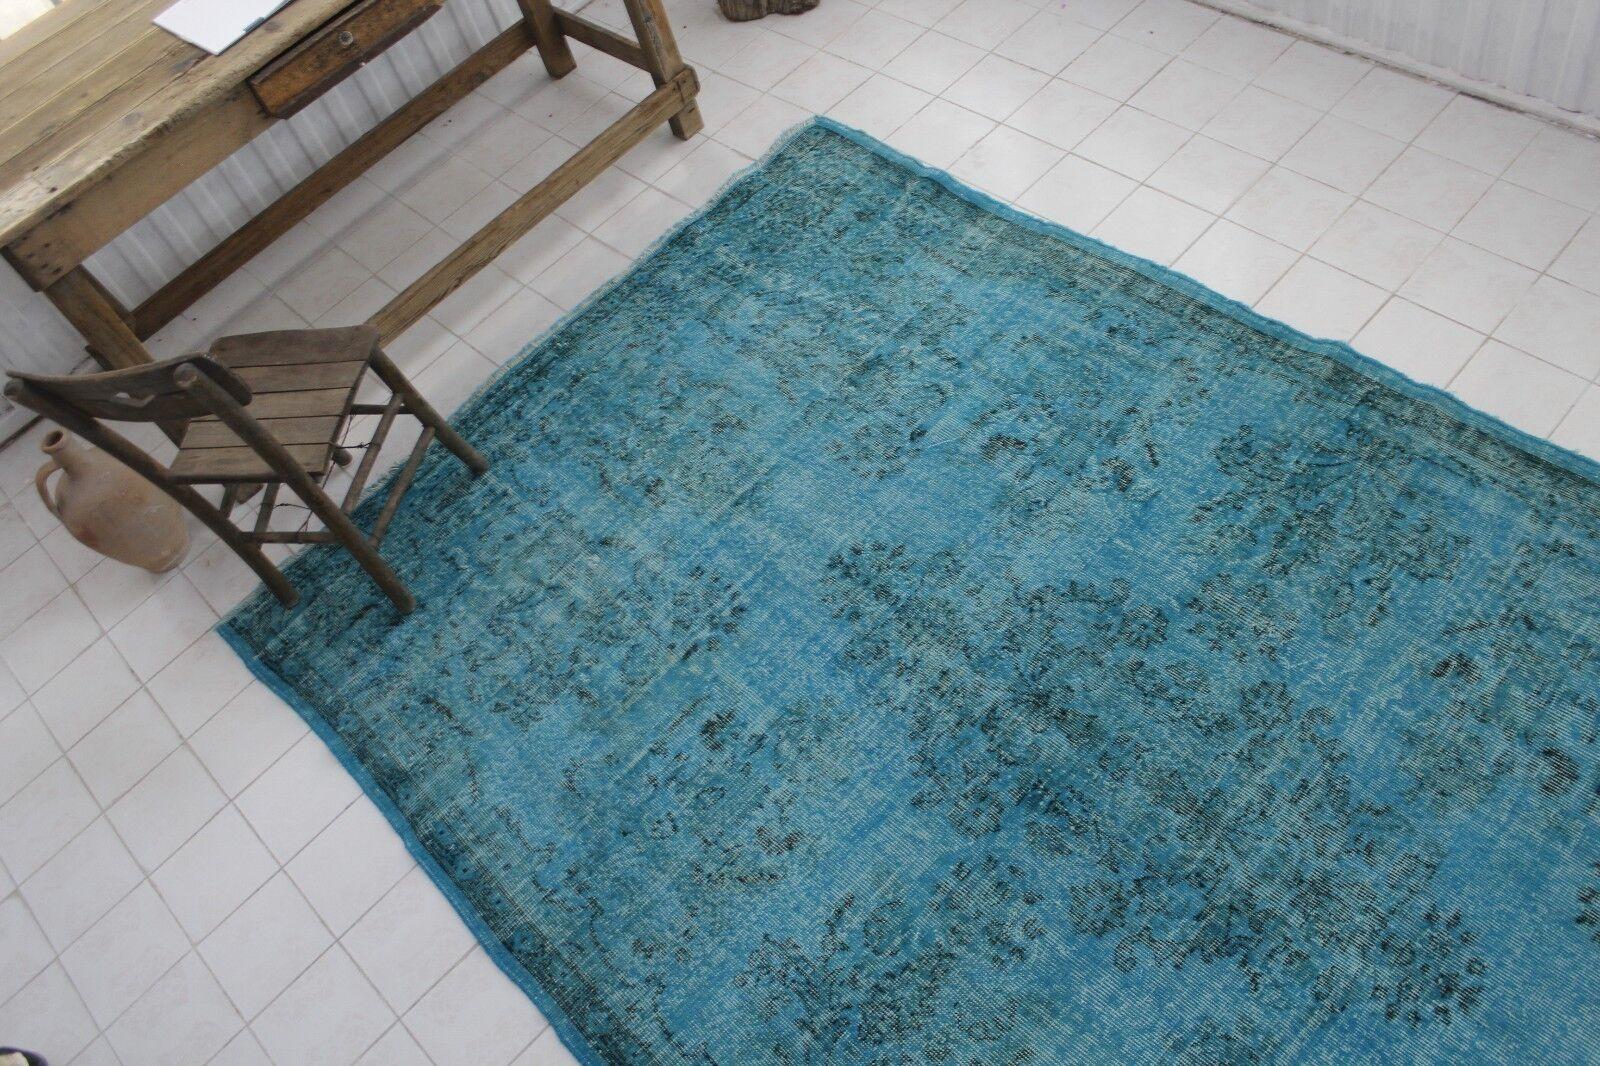 10x6 Vintage hecha a mano Overdyed alfombra turca pequeñas Turquesa 118 x75